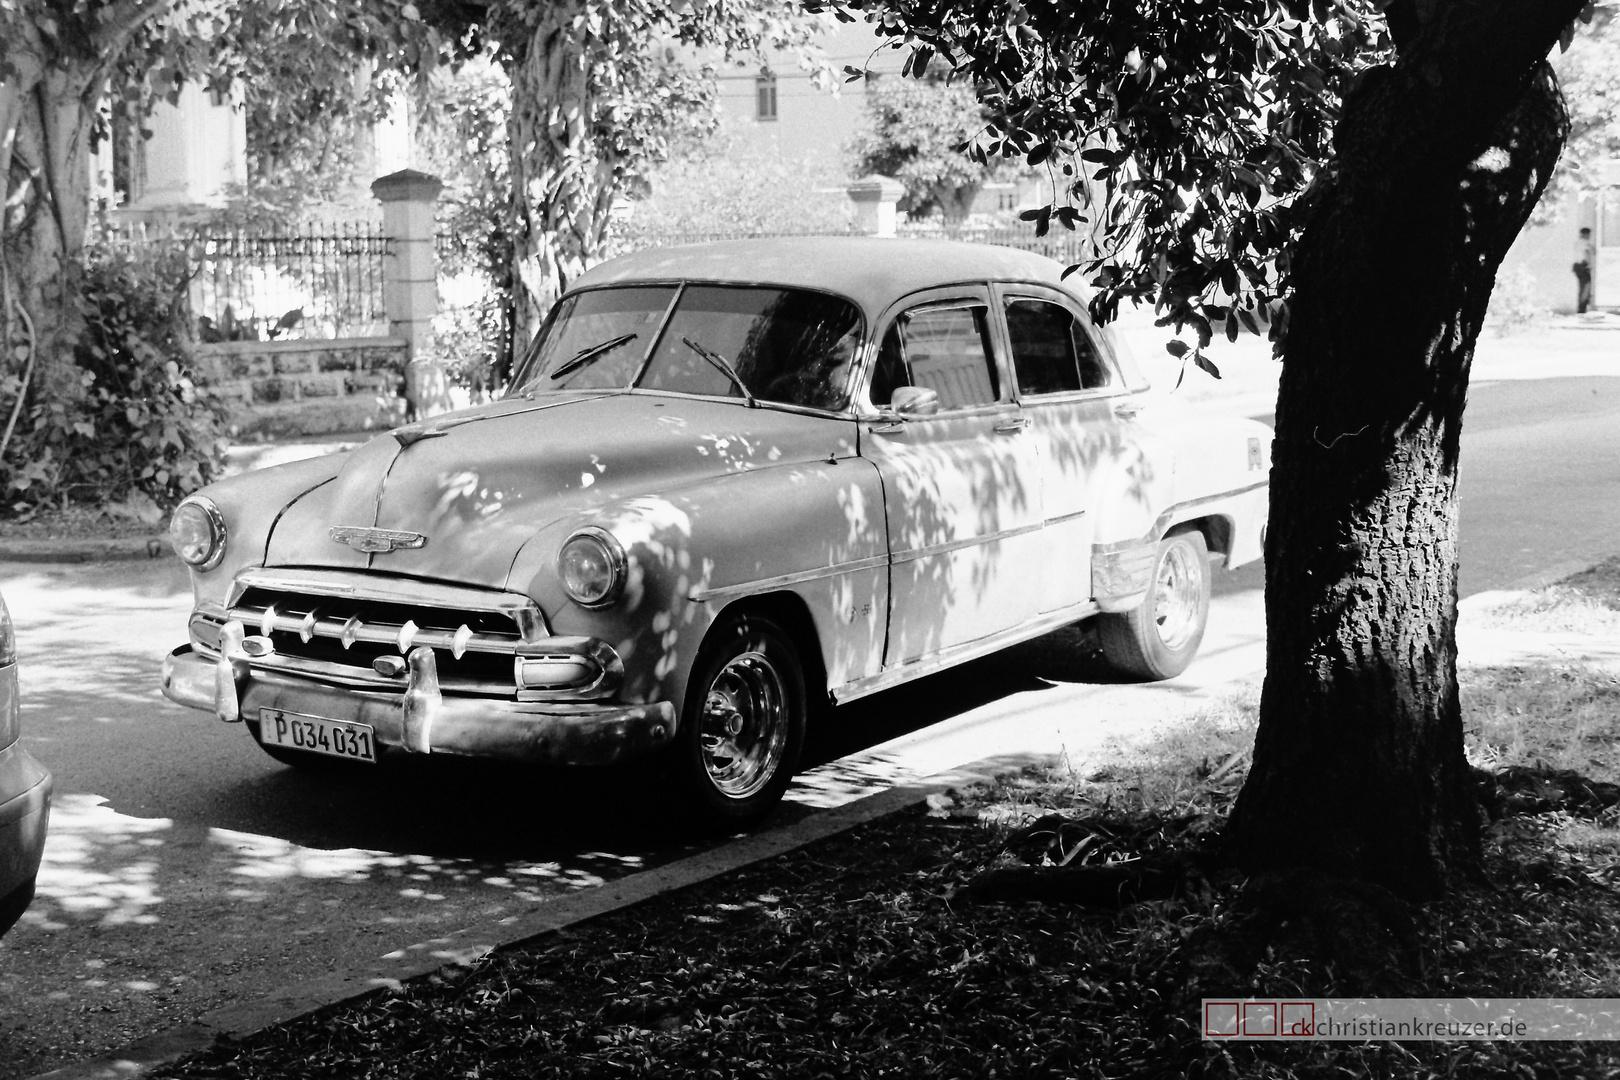 Auto in Havanna Cuba